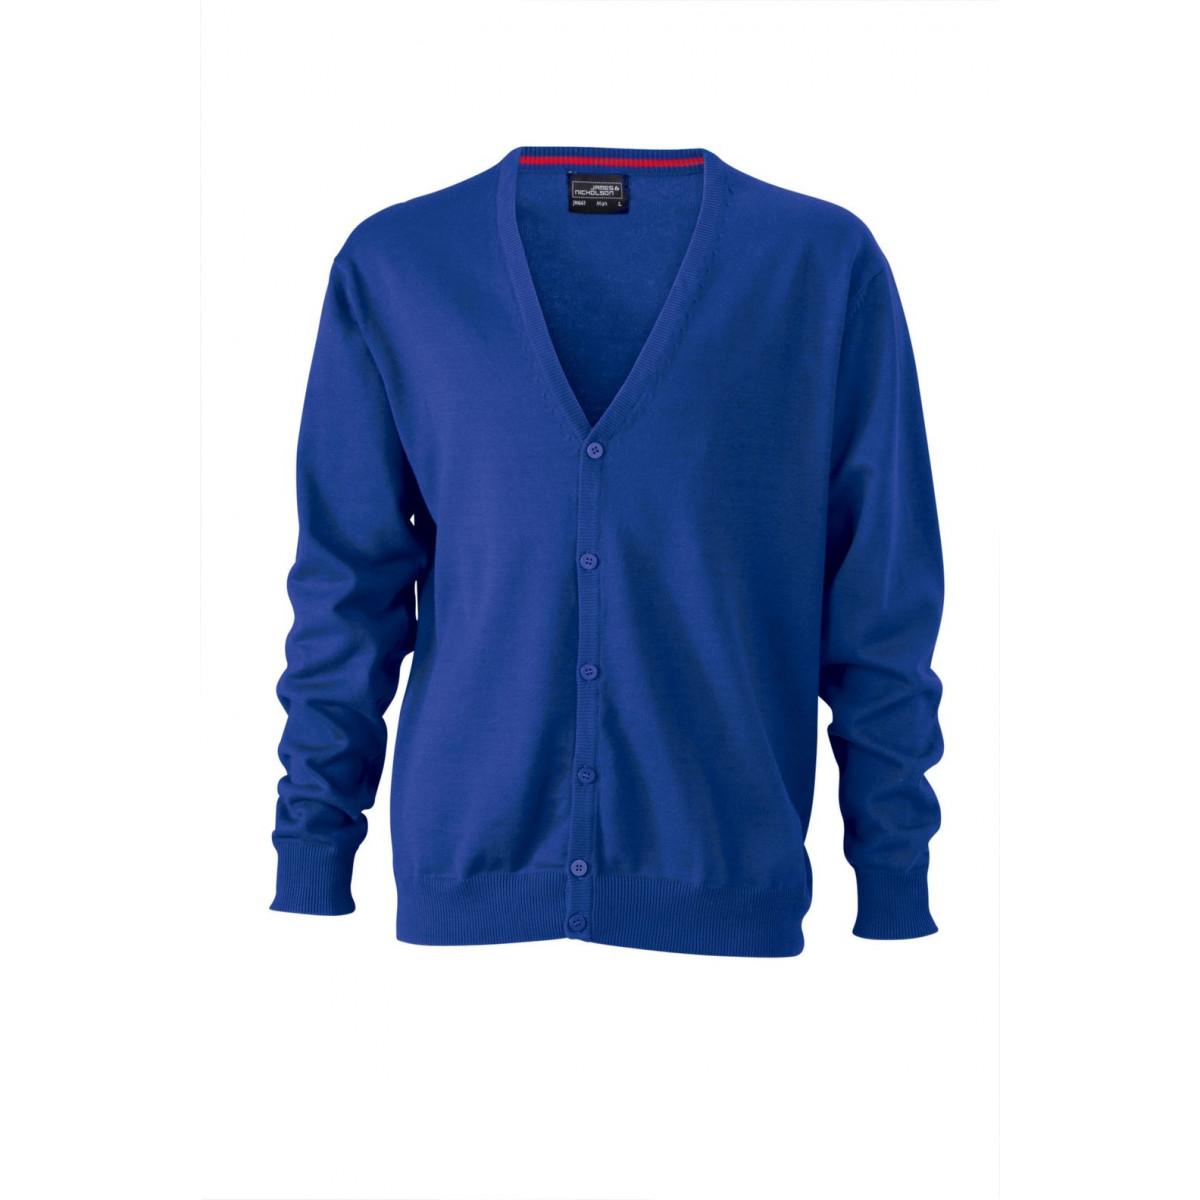 Кардиган мужской JN661 Mens V-Neck Cardigan - Ярко-синий